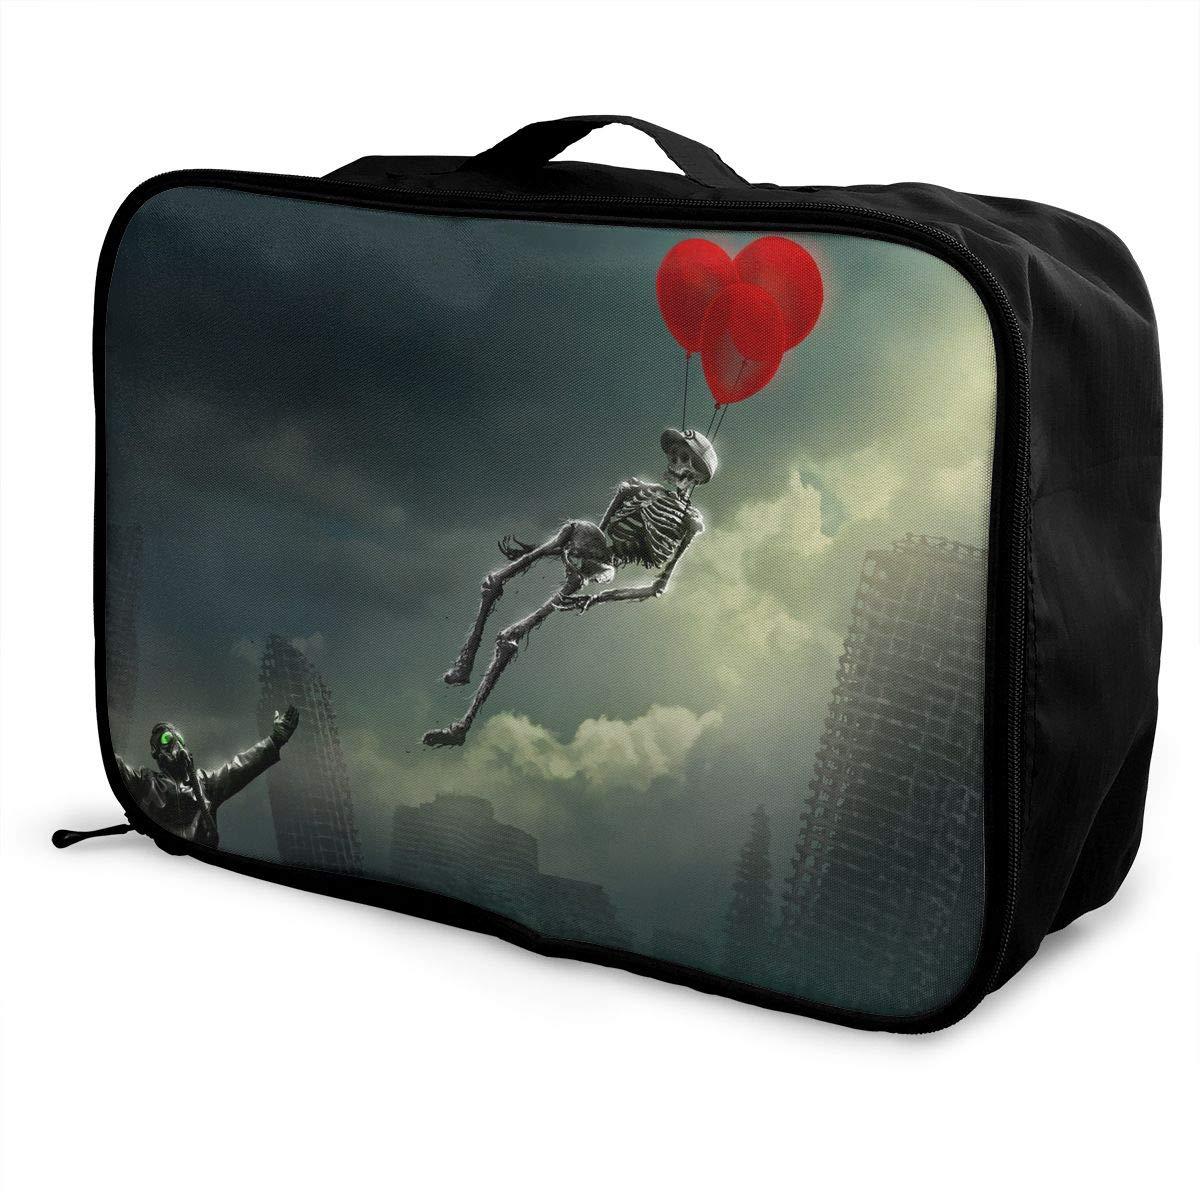 Travel Luggage Duffle Bag Lightweight Portable Handbag Hot Air Balloons Large Capacity Waterproof Foldable Storage Tote